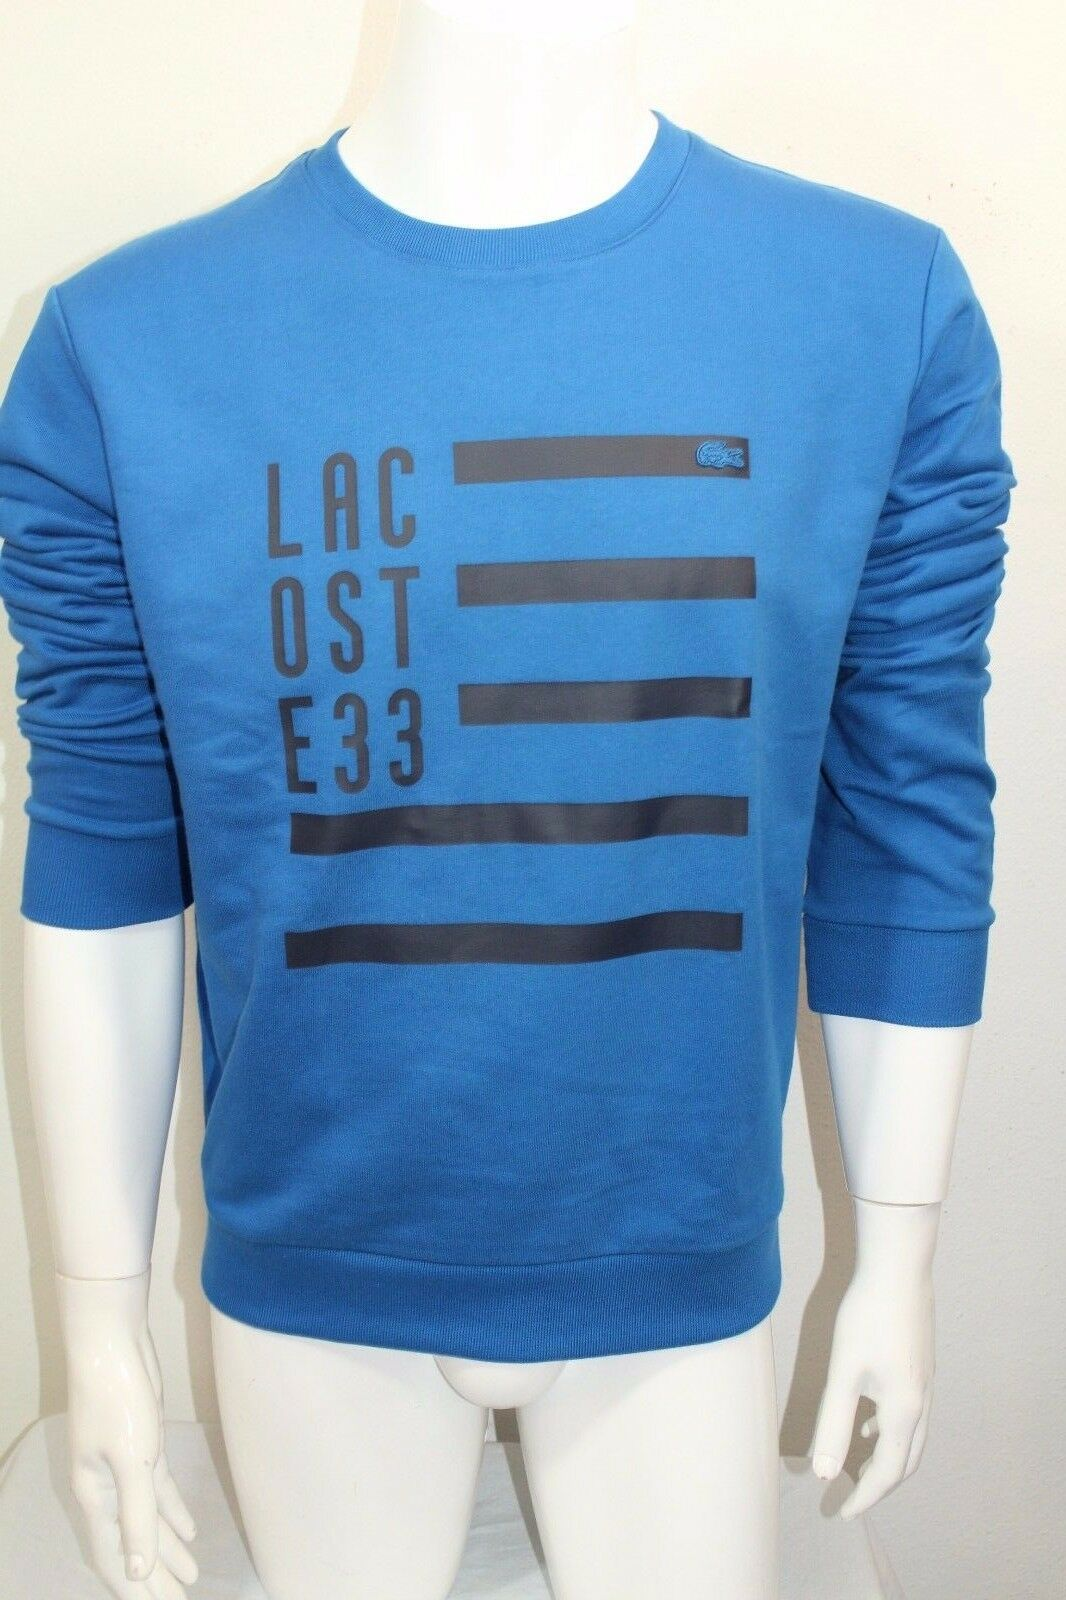 Lacoste 33 Men's Crew Sweater Shirt Long Sleeve color bluee Sz 7=XLarge NWT